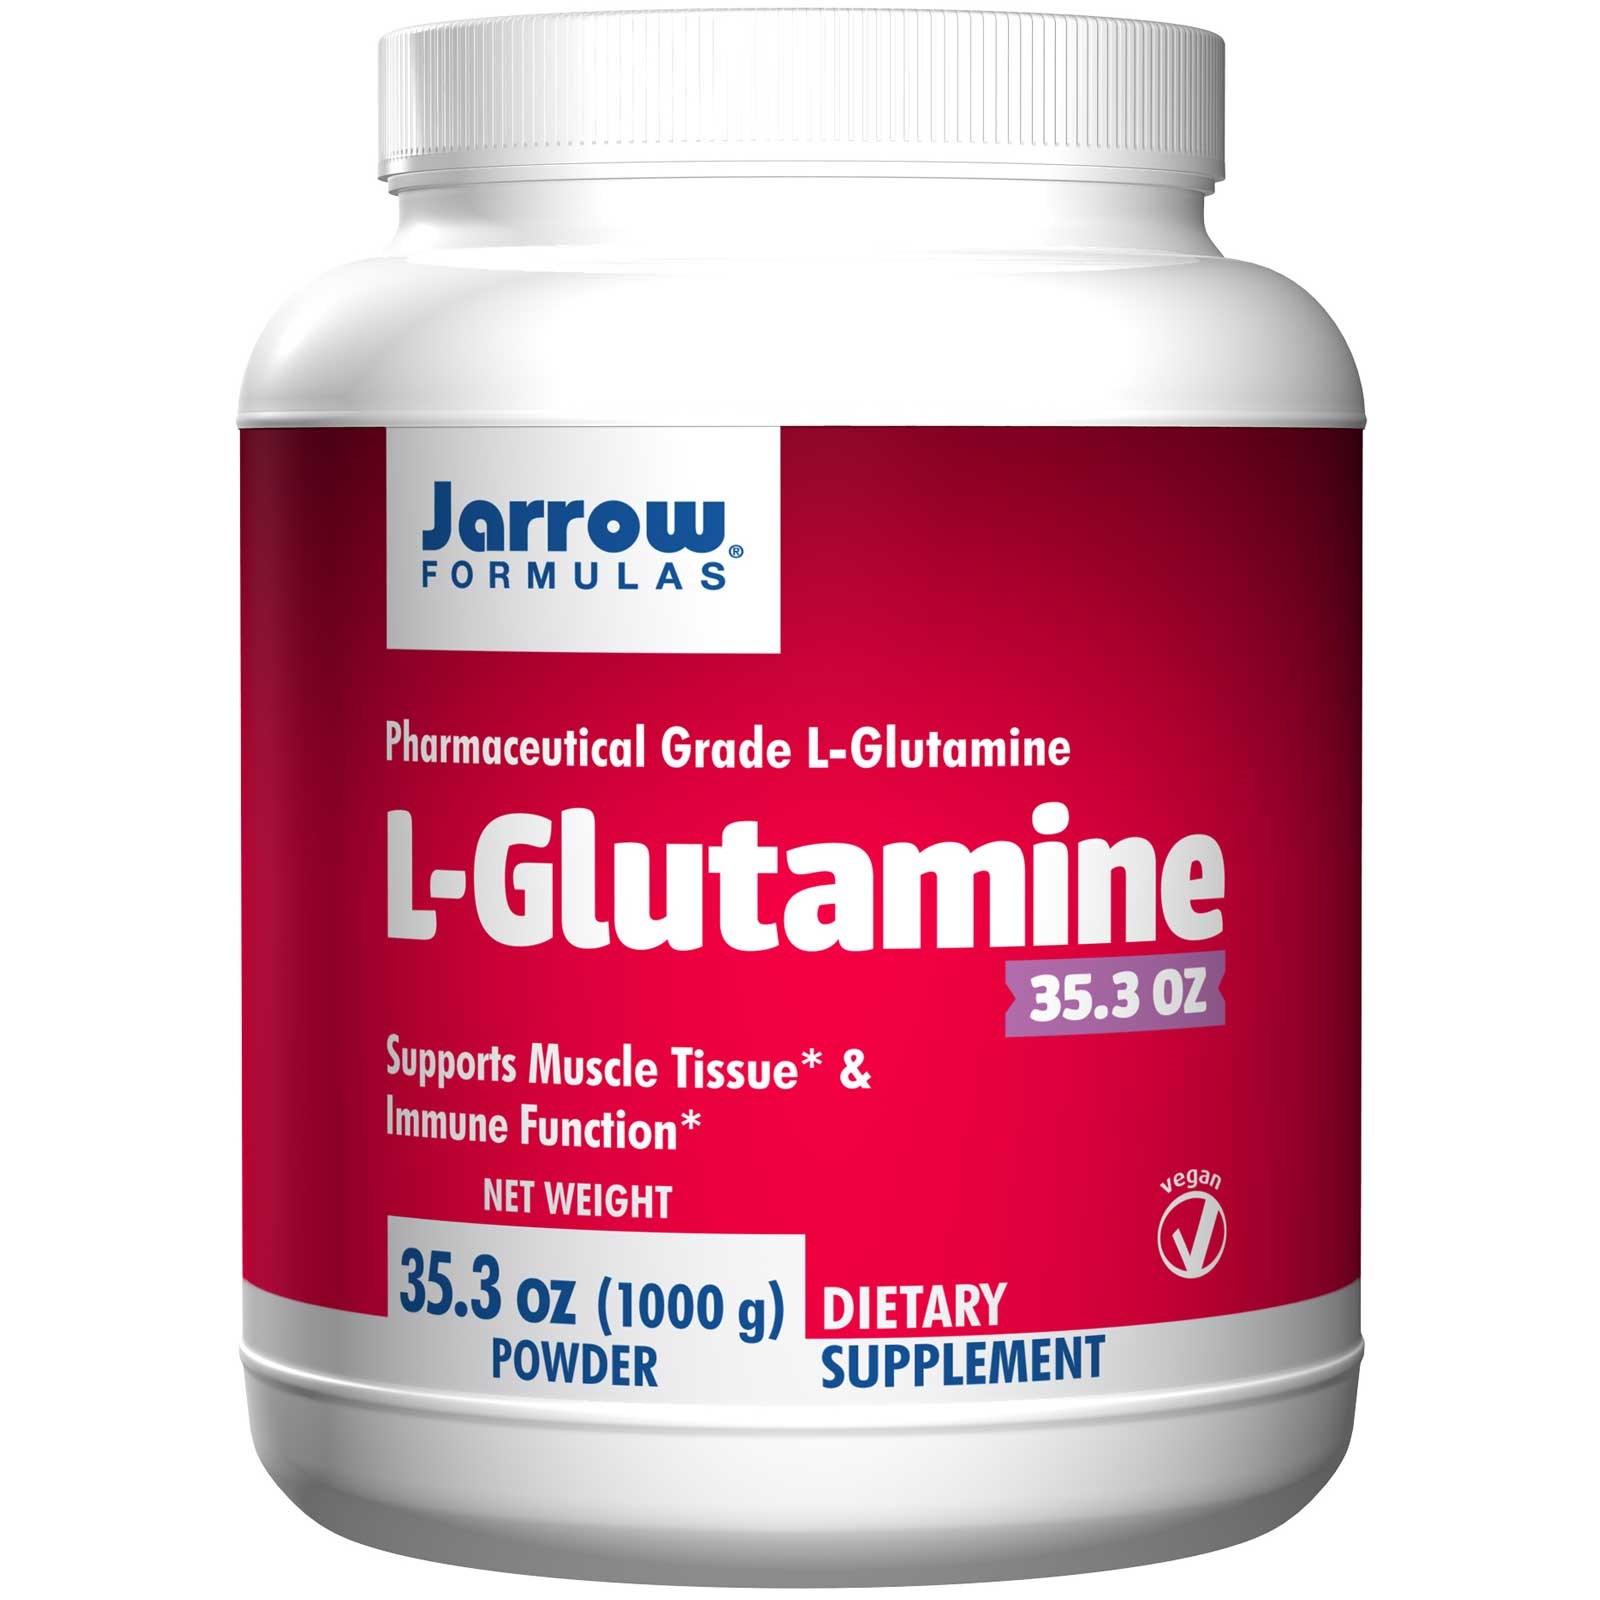 Image of L-Glutamine Powder (1000 gram) - Jarrow Formulas 0790011150350